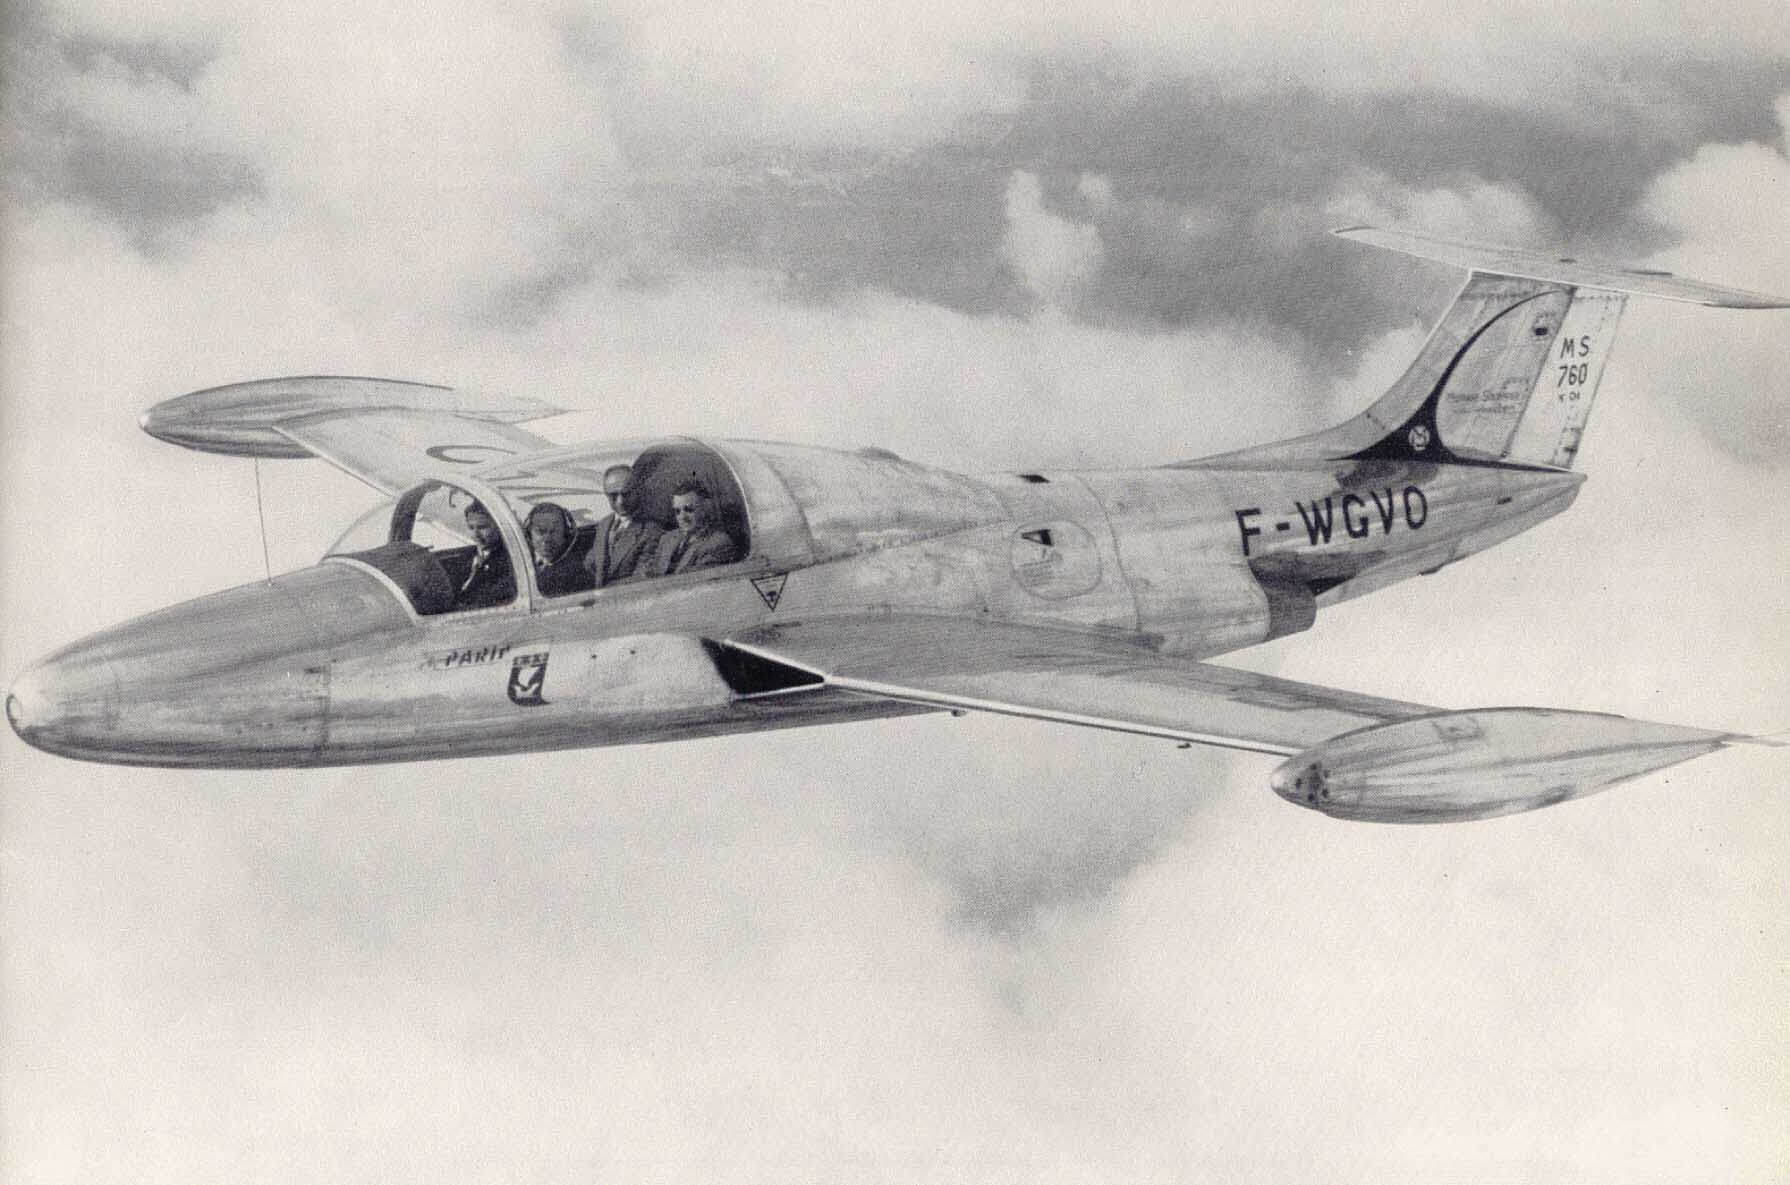 Flight Manual for the Morane Saulnier MS760 Paris